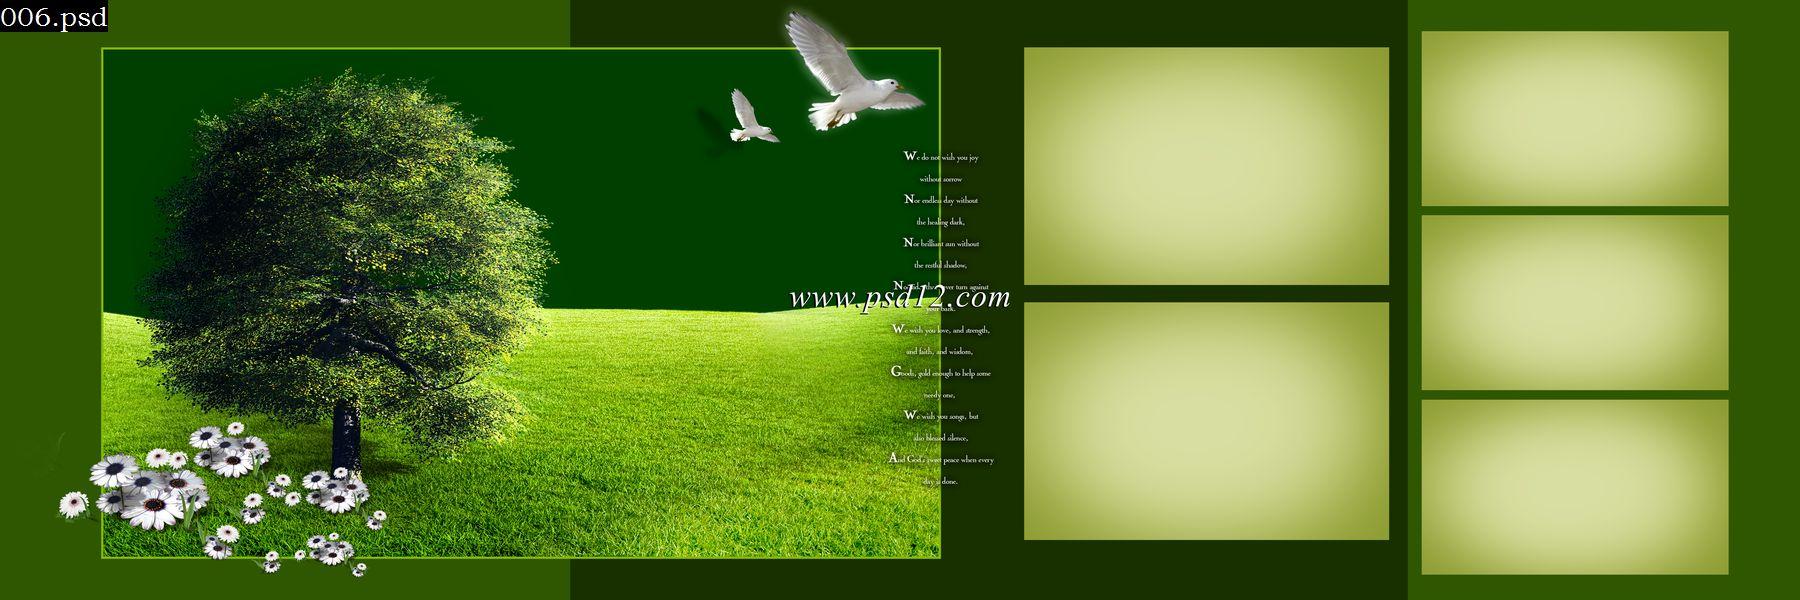 Karizma Album PSD free Download